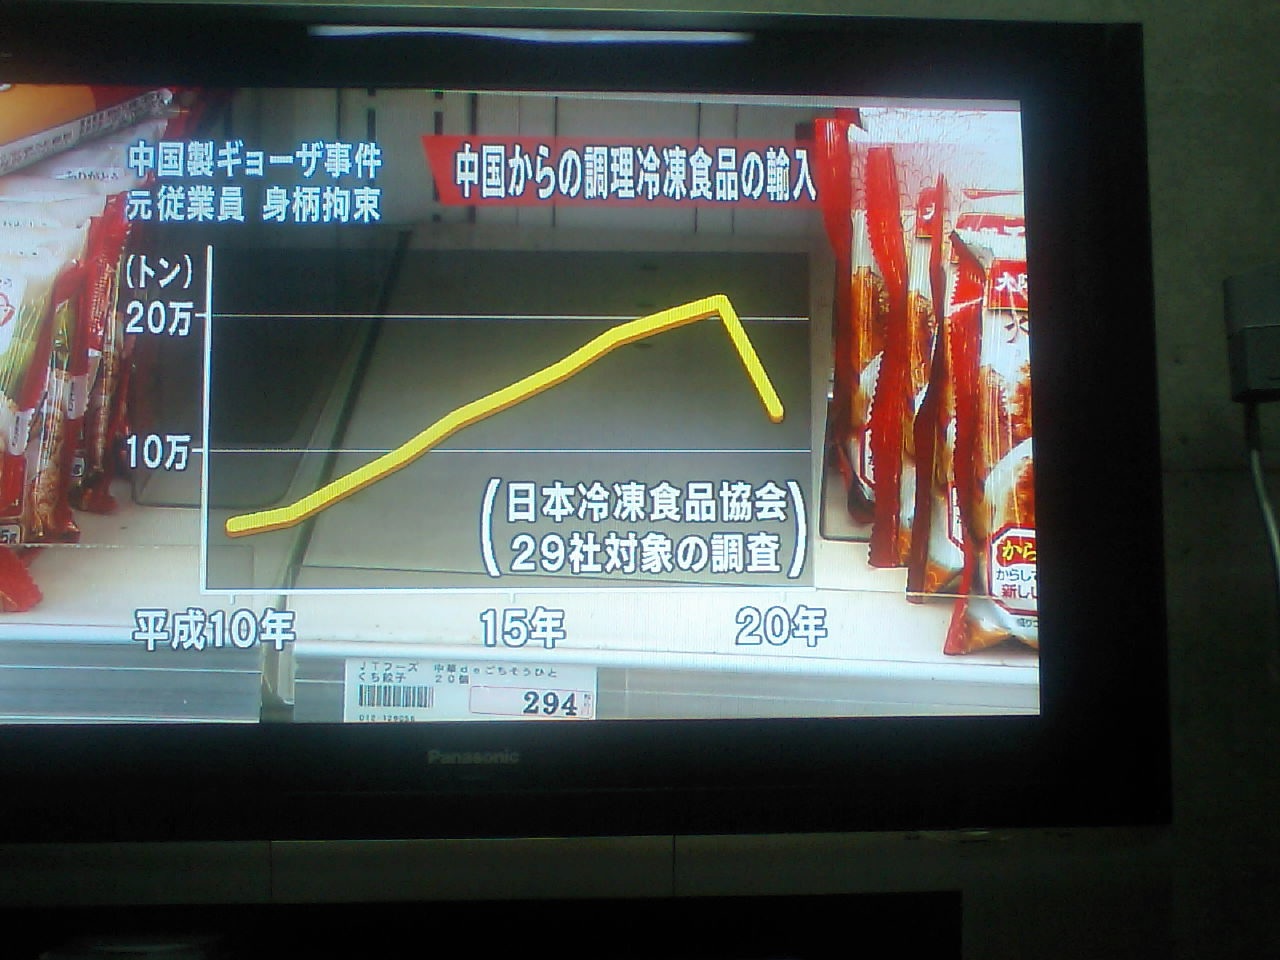 NHK 餃子事件犯人逮捕の報道 7時台ニュース14分_d0027795_199992.jpg